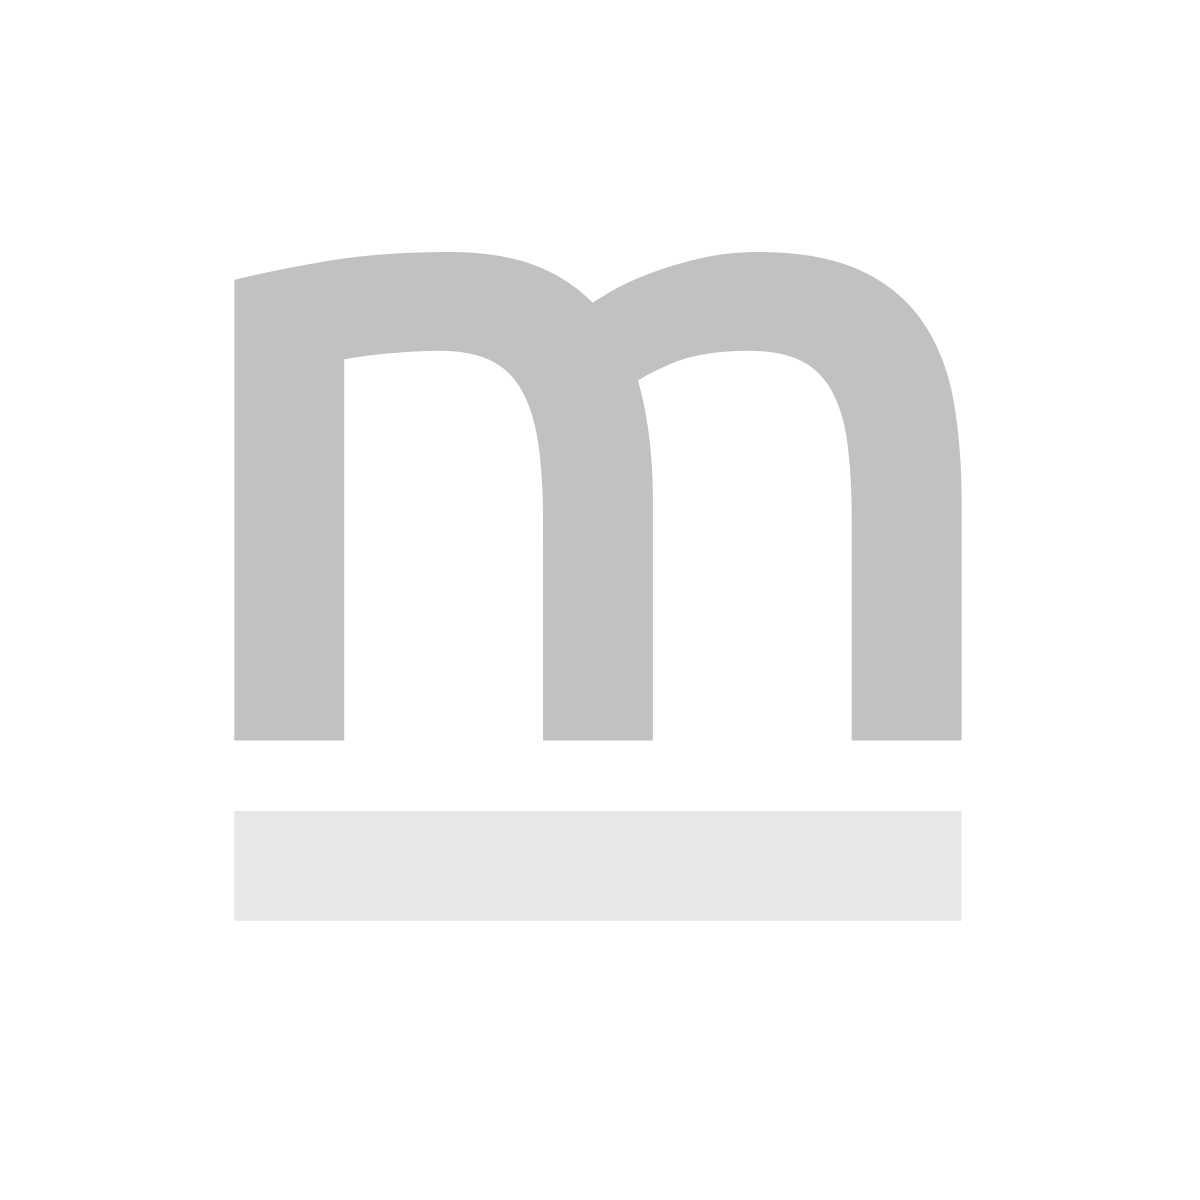 Stół DABLIN 160x90 dąb lite drewno